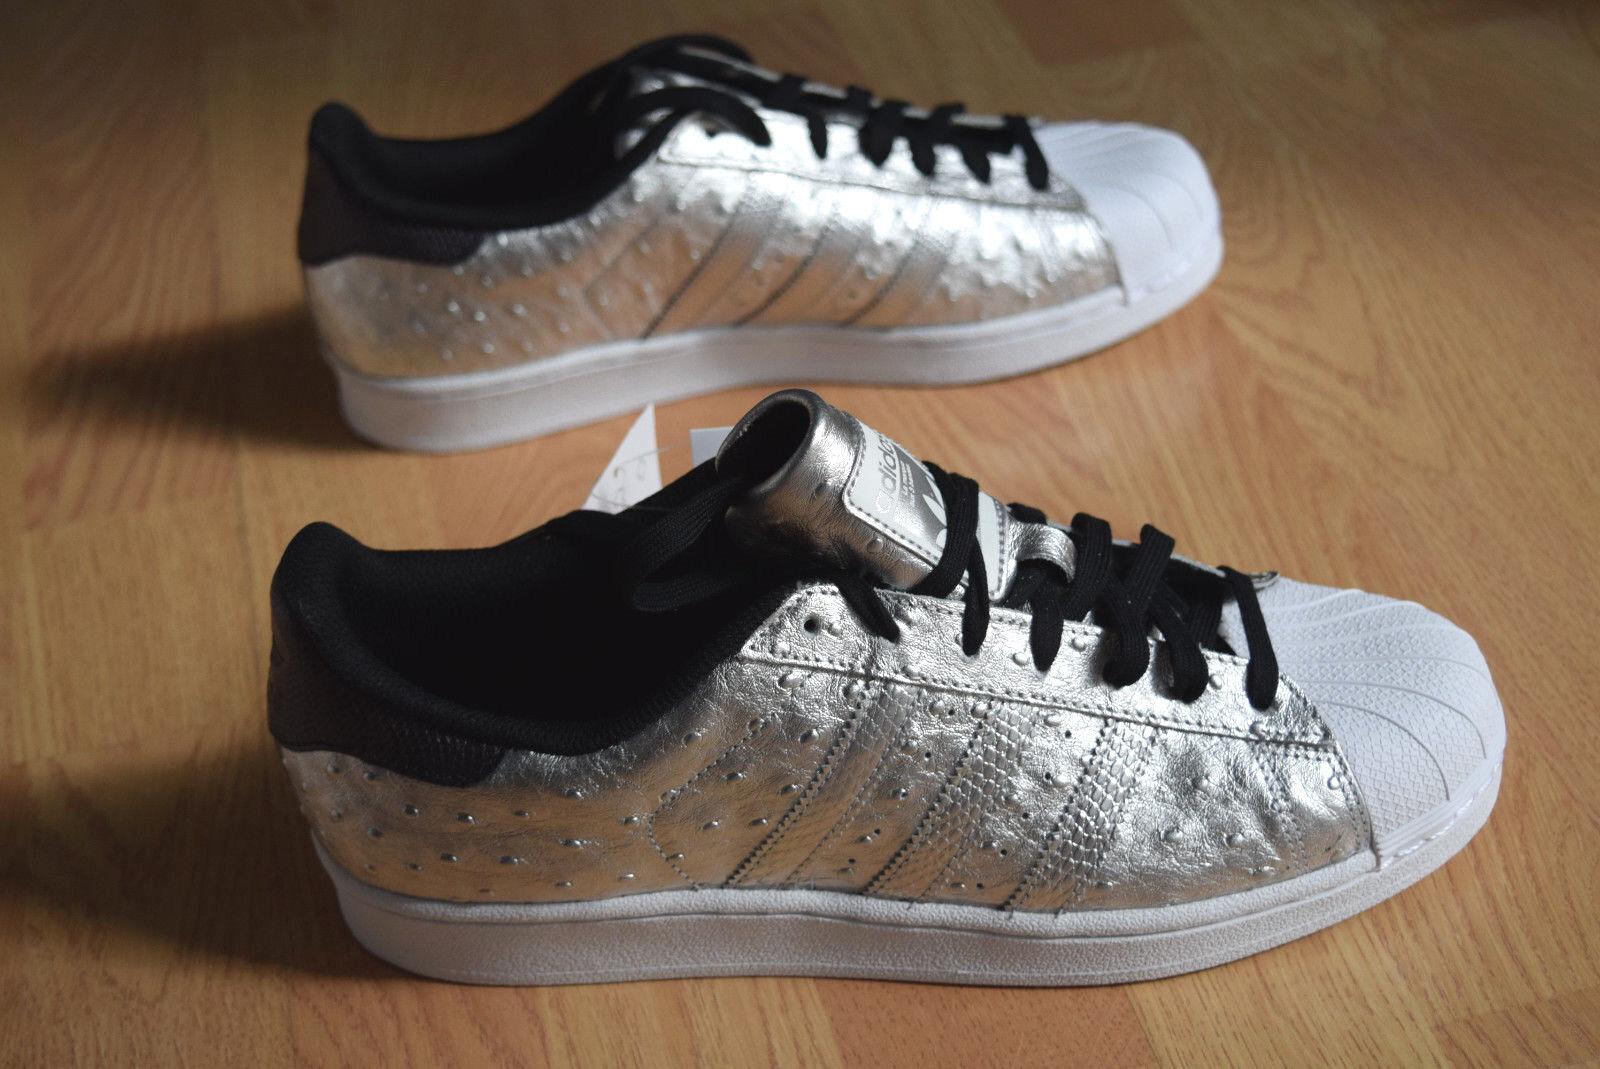 adidas Superstar 80s  40 41 42 43 44  80's AQ4701 cAmPuS sTan smitH 80's  grand slaM 8ea49d